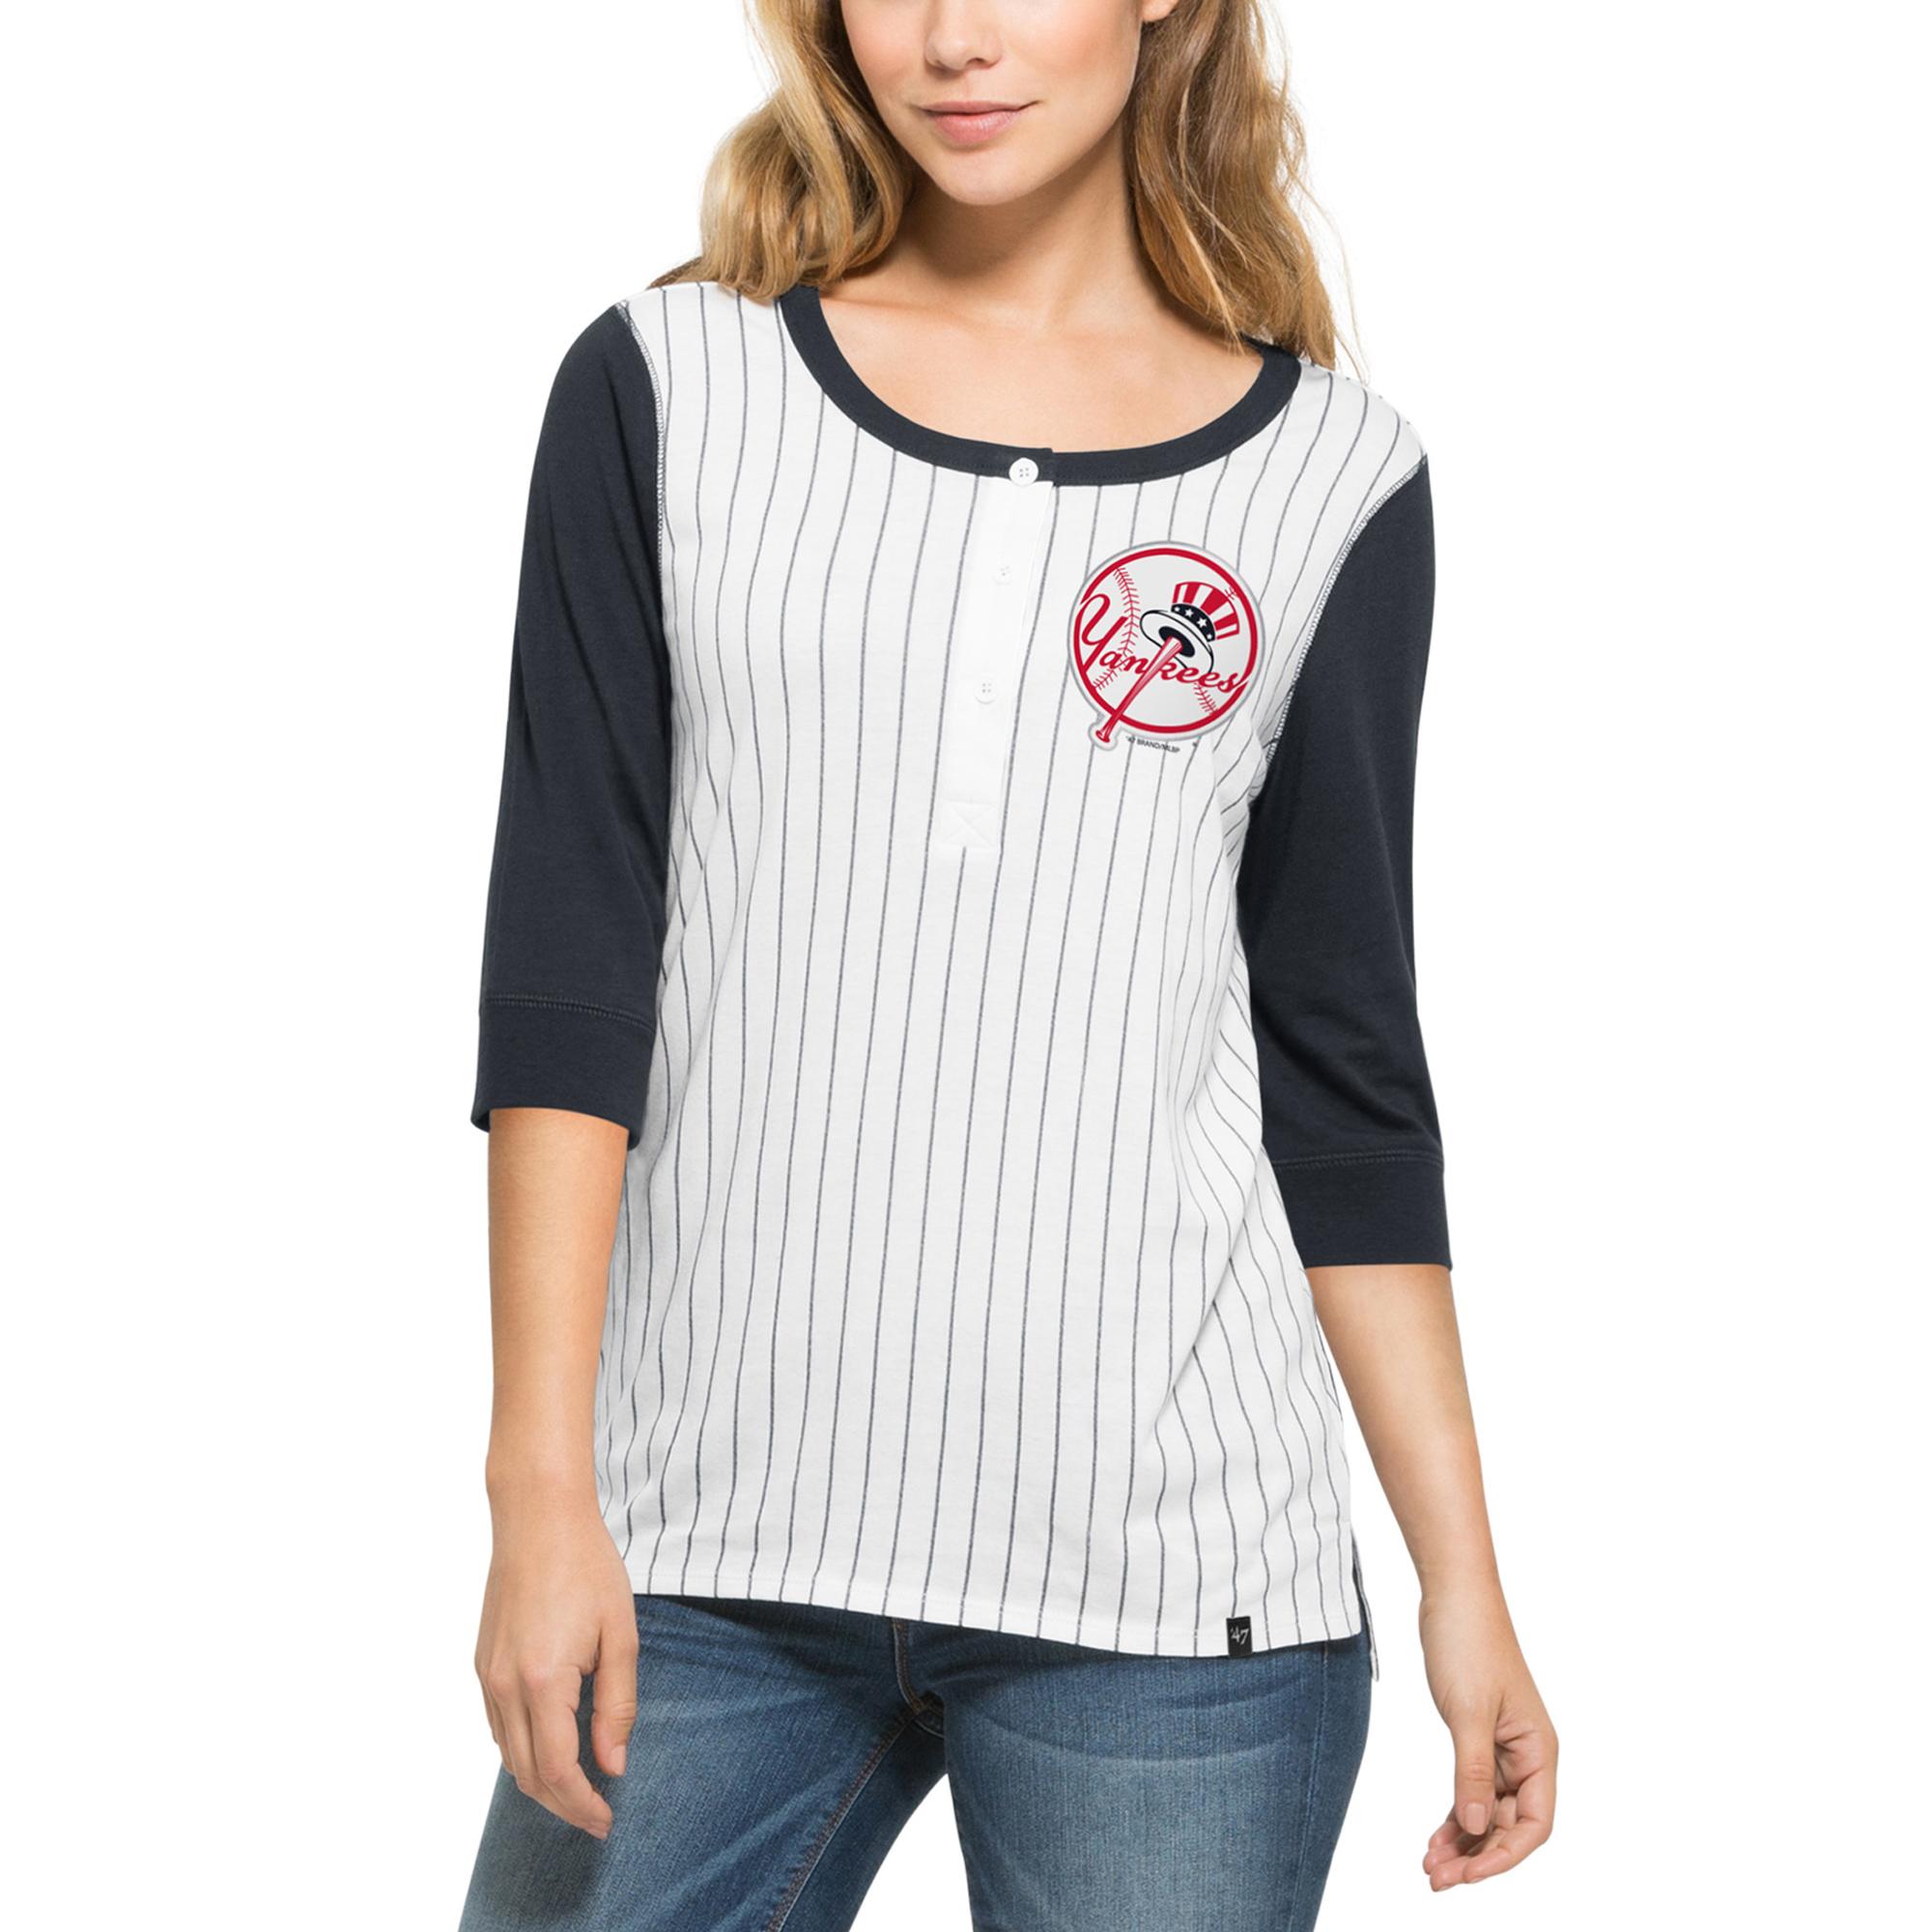 New York Yankees '47 Women's Triple Crown Henley Three-Quarter Sleeve T-Shirt - White/Navy